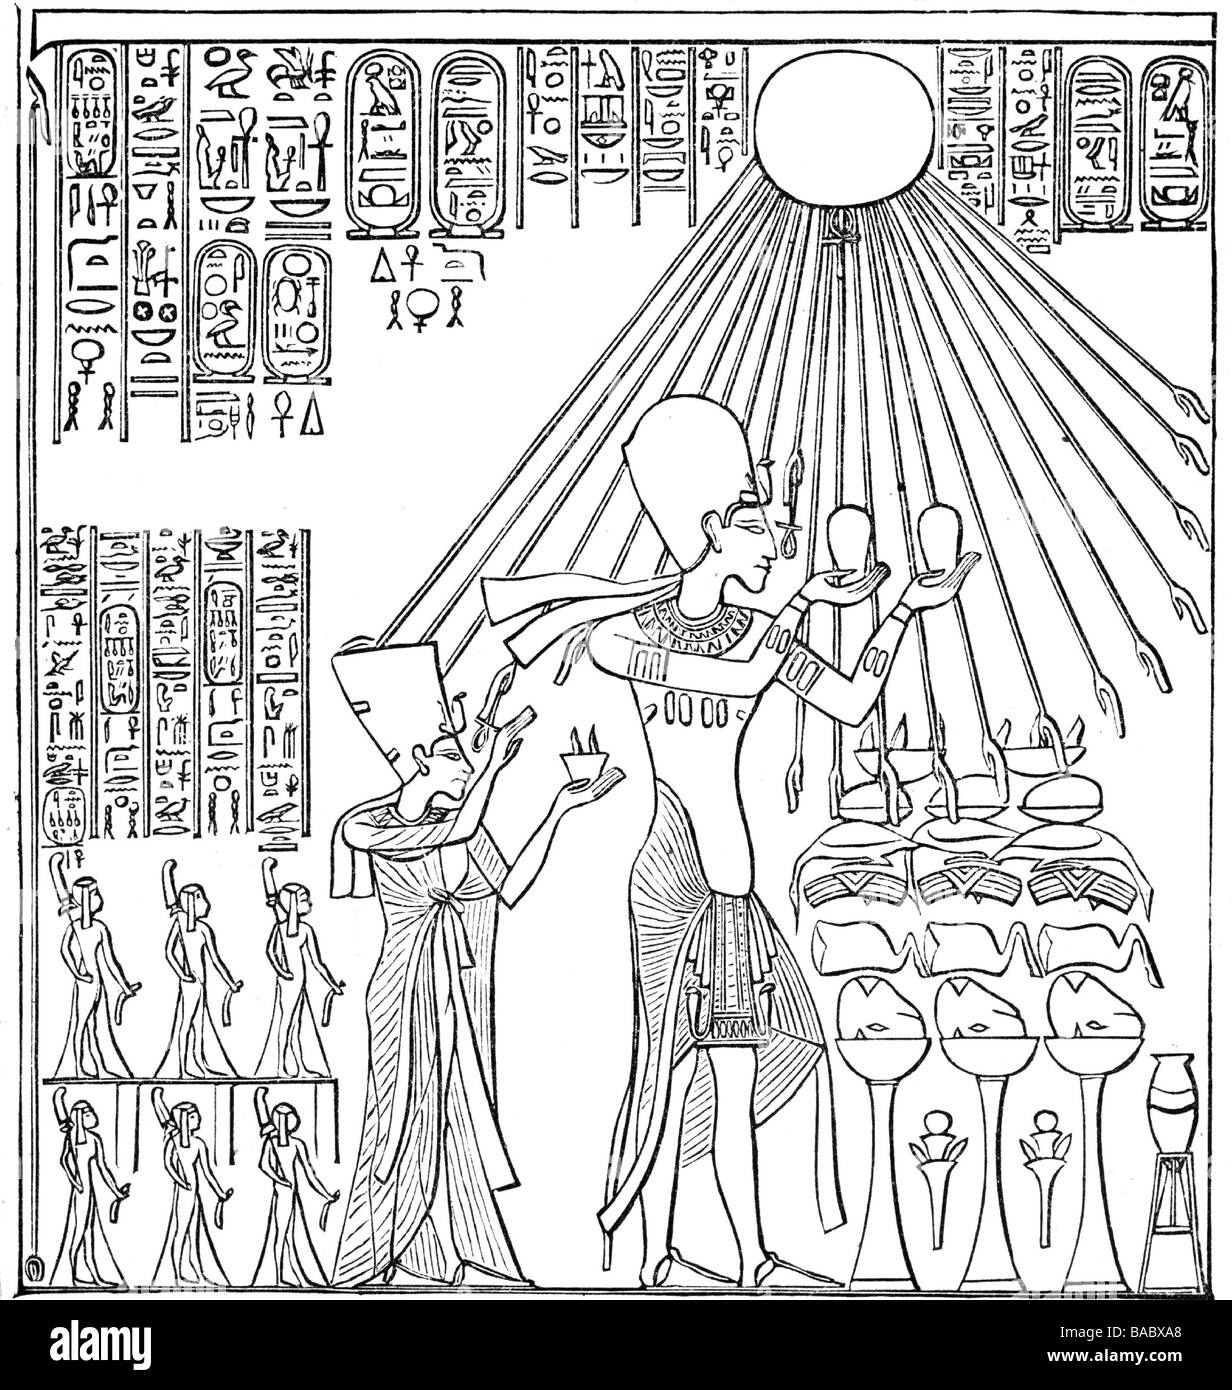 Akhenaten (Amenhotep IV), King of Egypt 1353 - 1336 BC, 18th Dynasty, full length, sacrificing to god Aton, behind - Stock Image